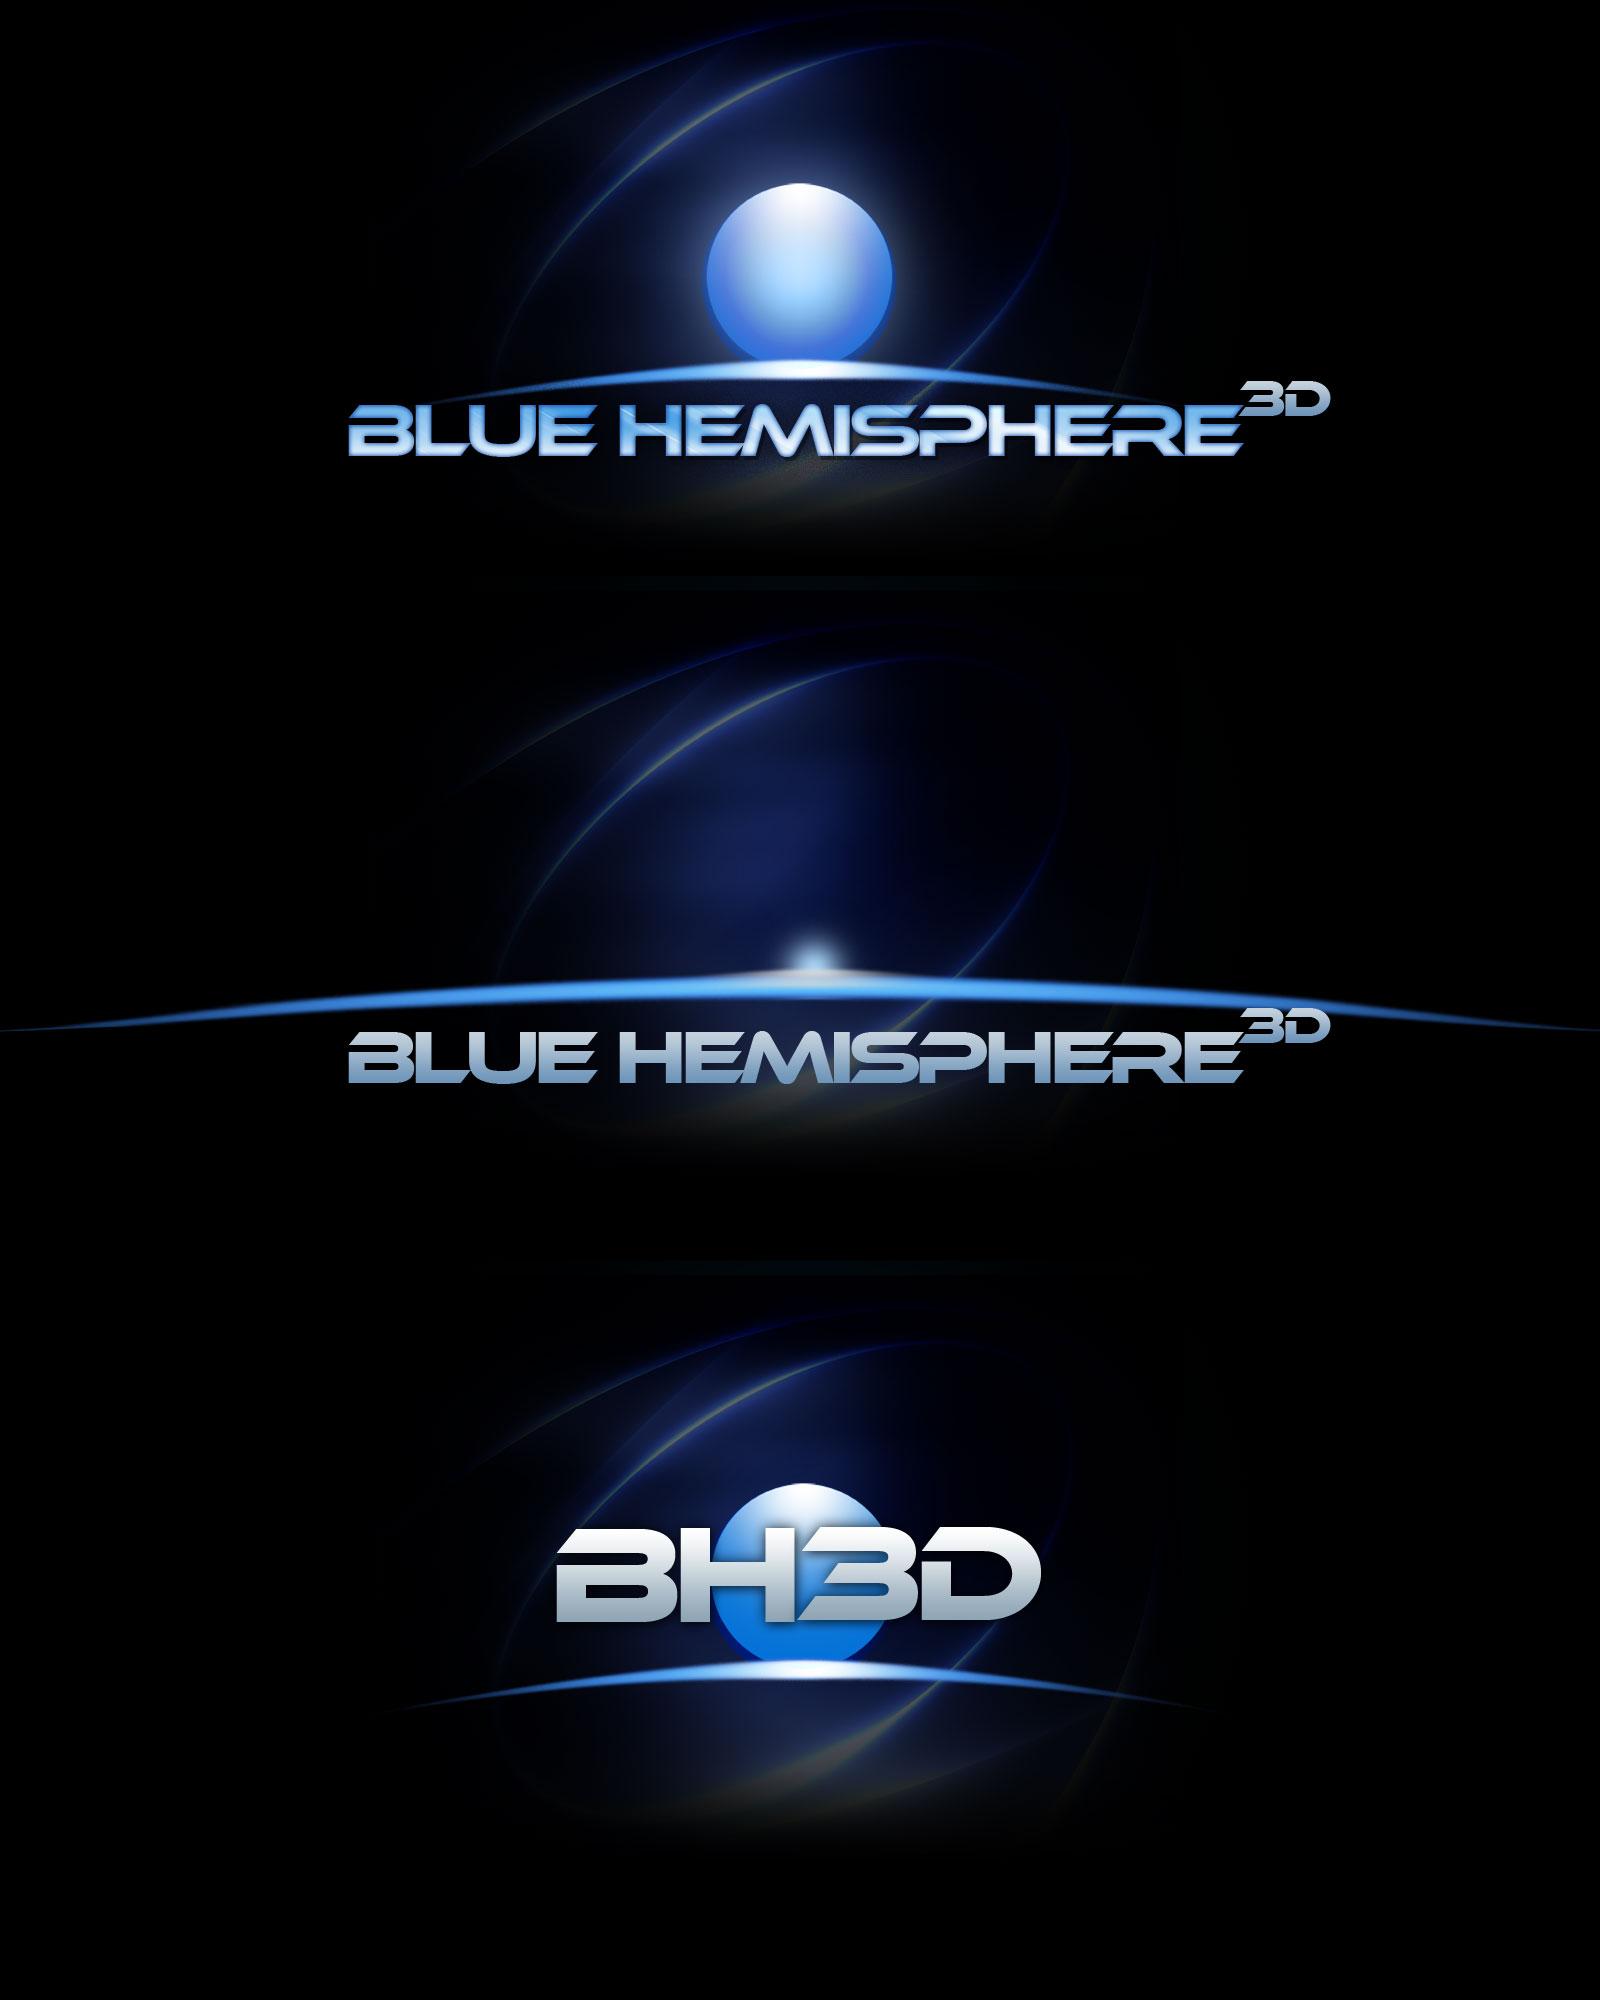 Blue Hemisphere Logos